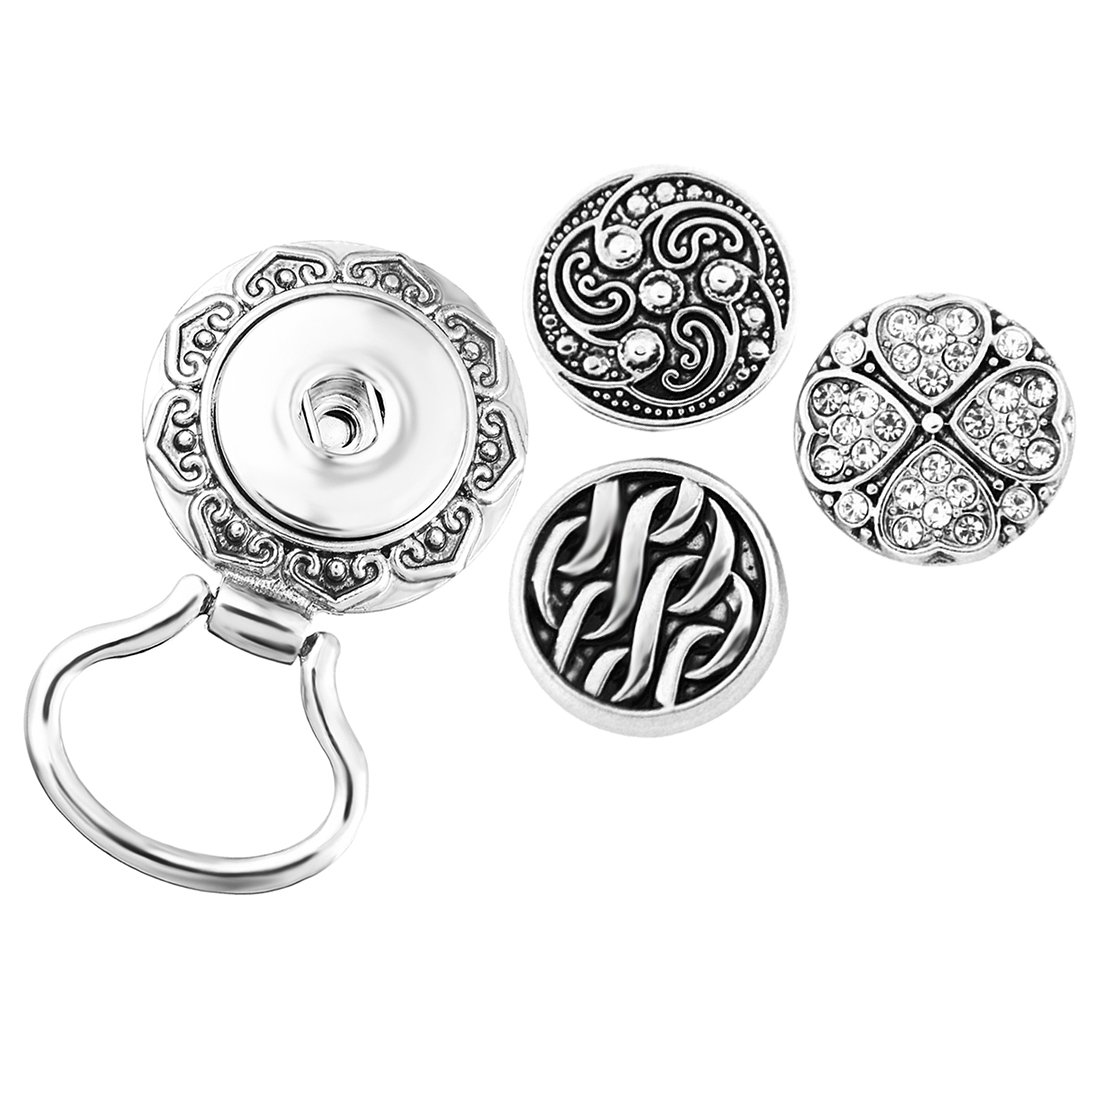 MJartoria Interchangeable Snap Buttons Centerpiece Eye Glass Holding Magnetic Brooch